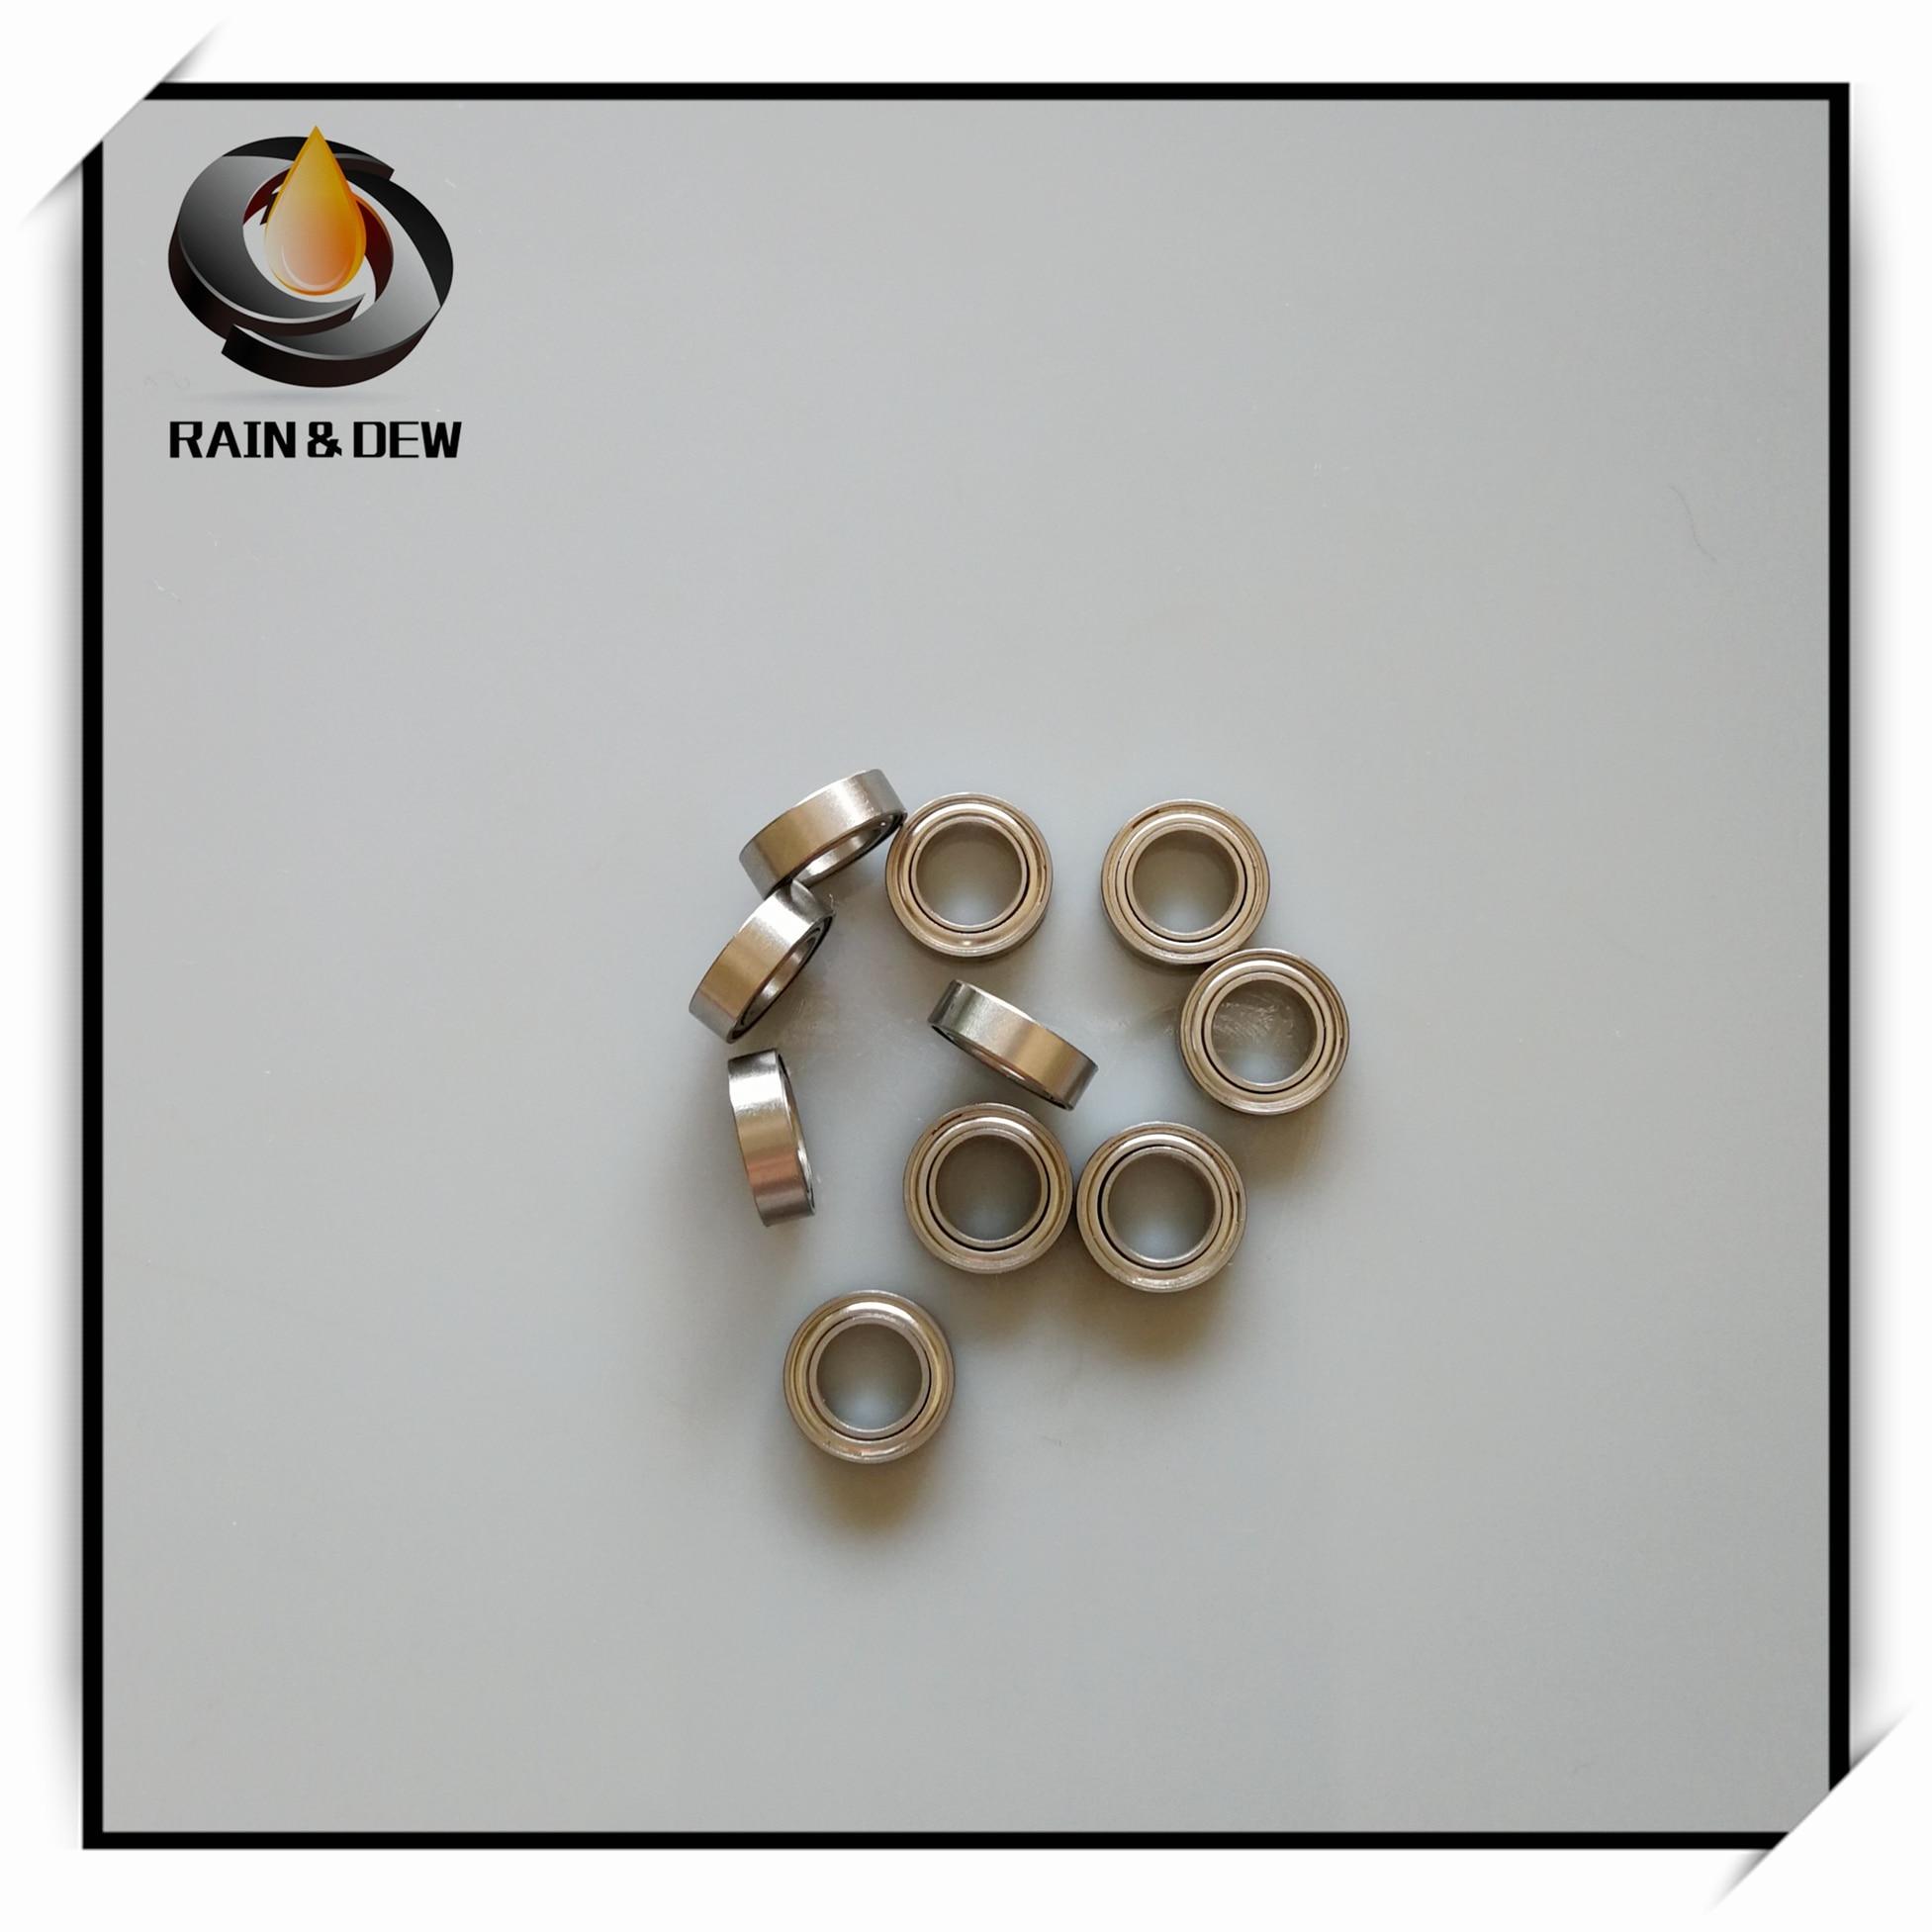 QTY 10 440c Stainless Steel Ball Bearing Bearings MR115ZZ 5x11x4 mm SMR115ZZ